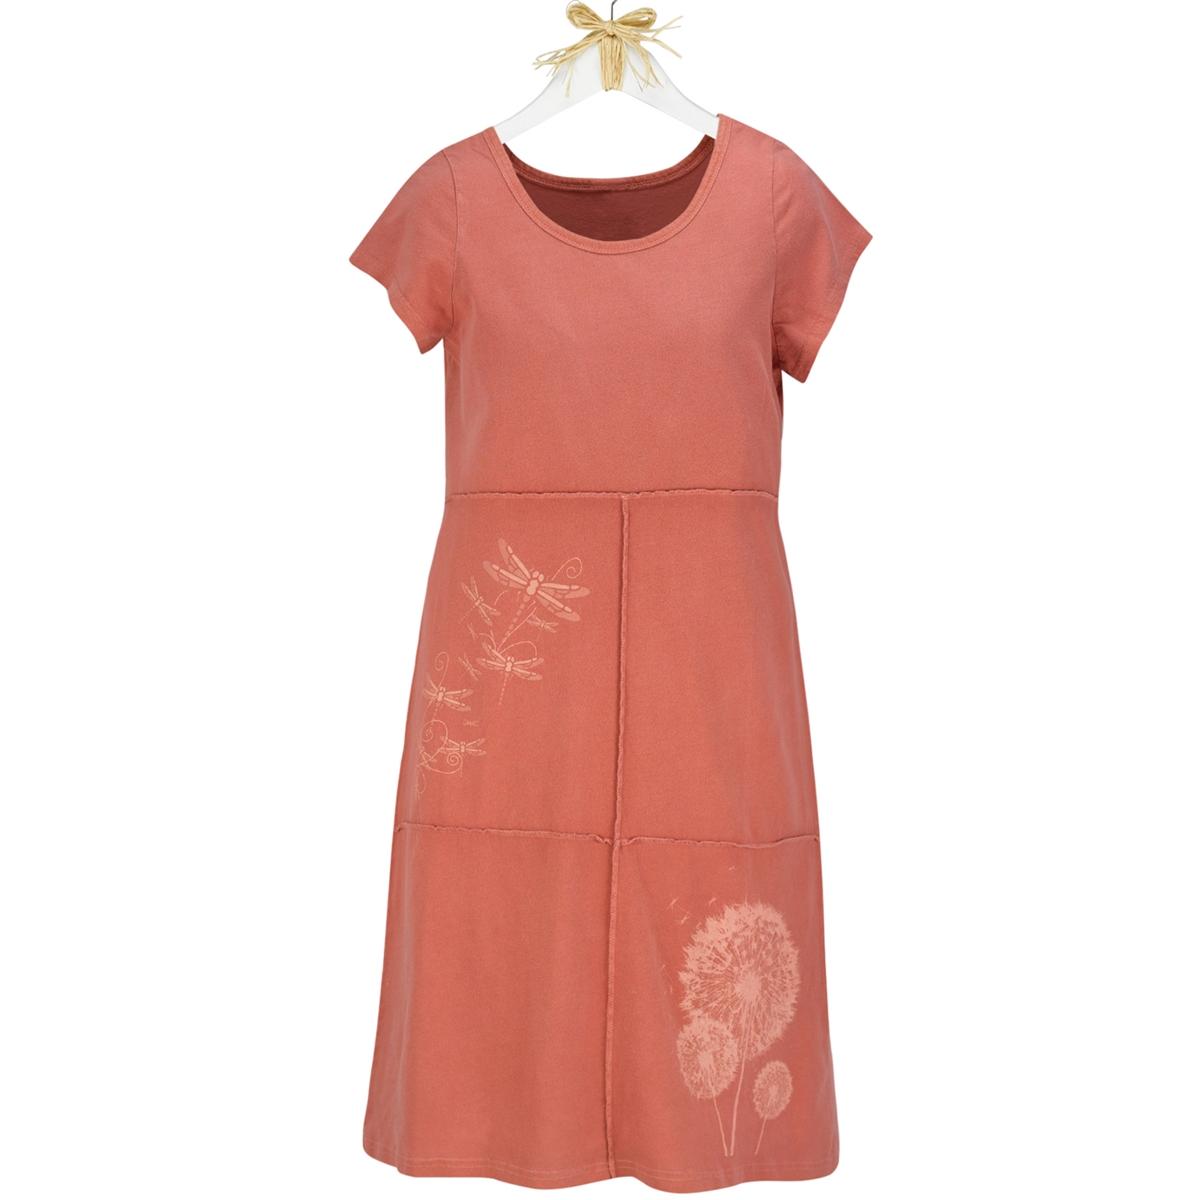 Dandelion and Dragonfly Organic Dress